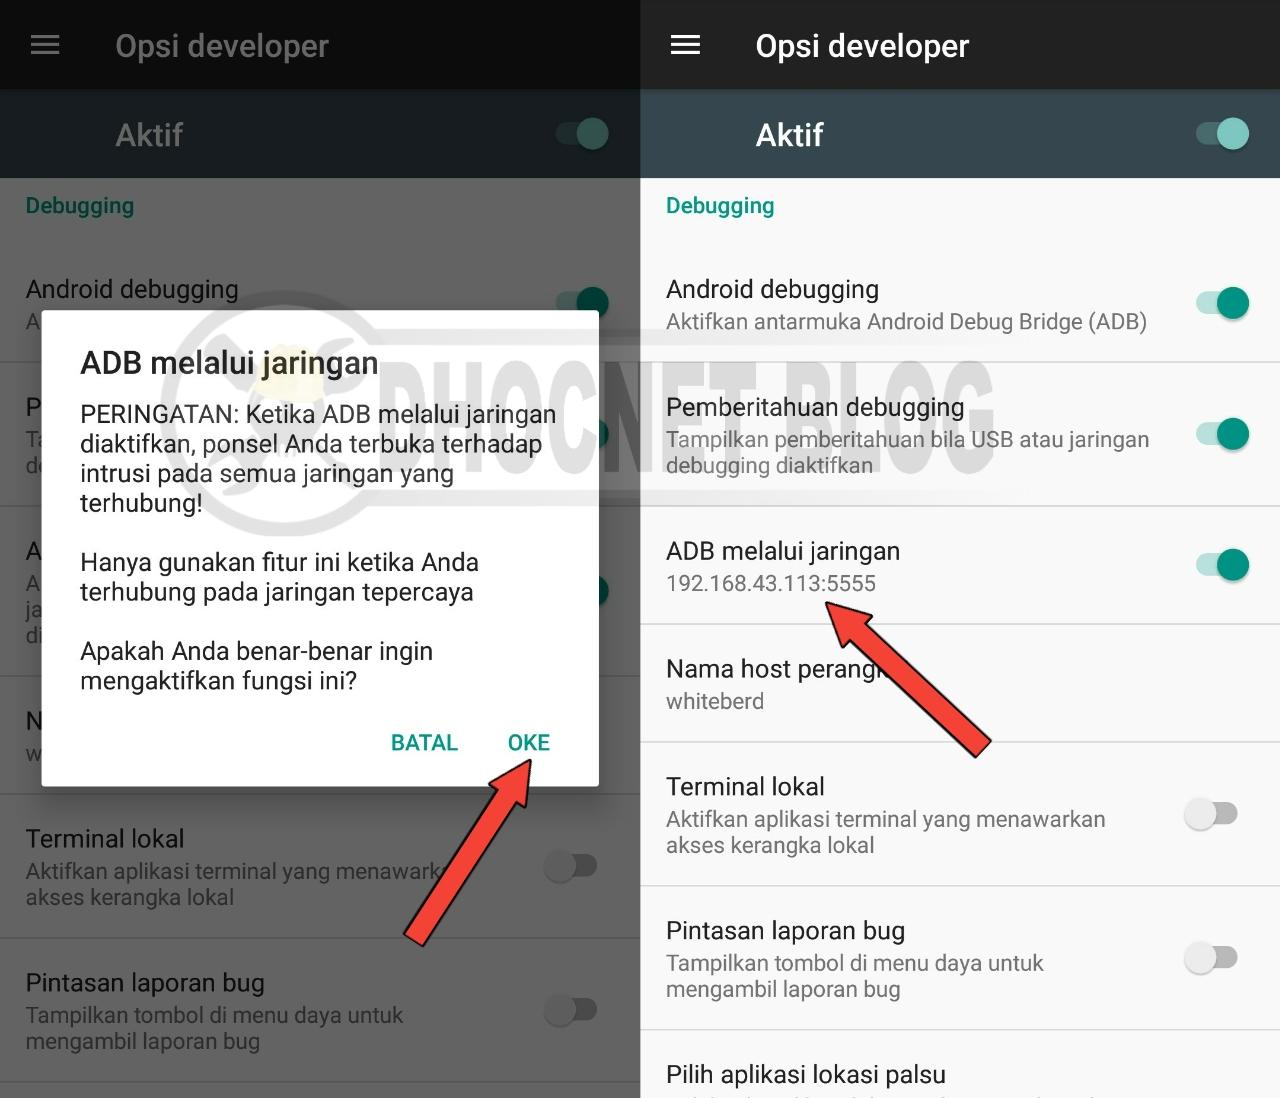 komunikasi android ke android dengan adb - blog.dhocnet.work